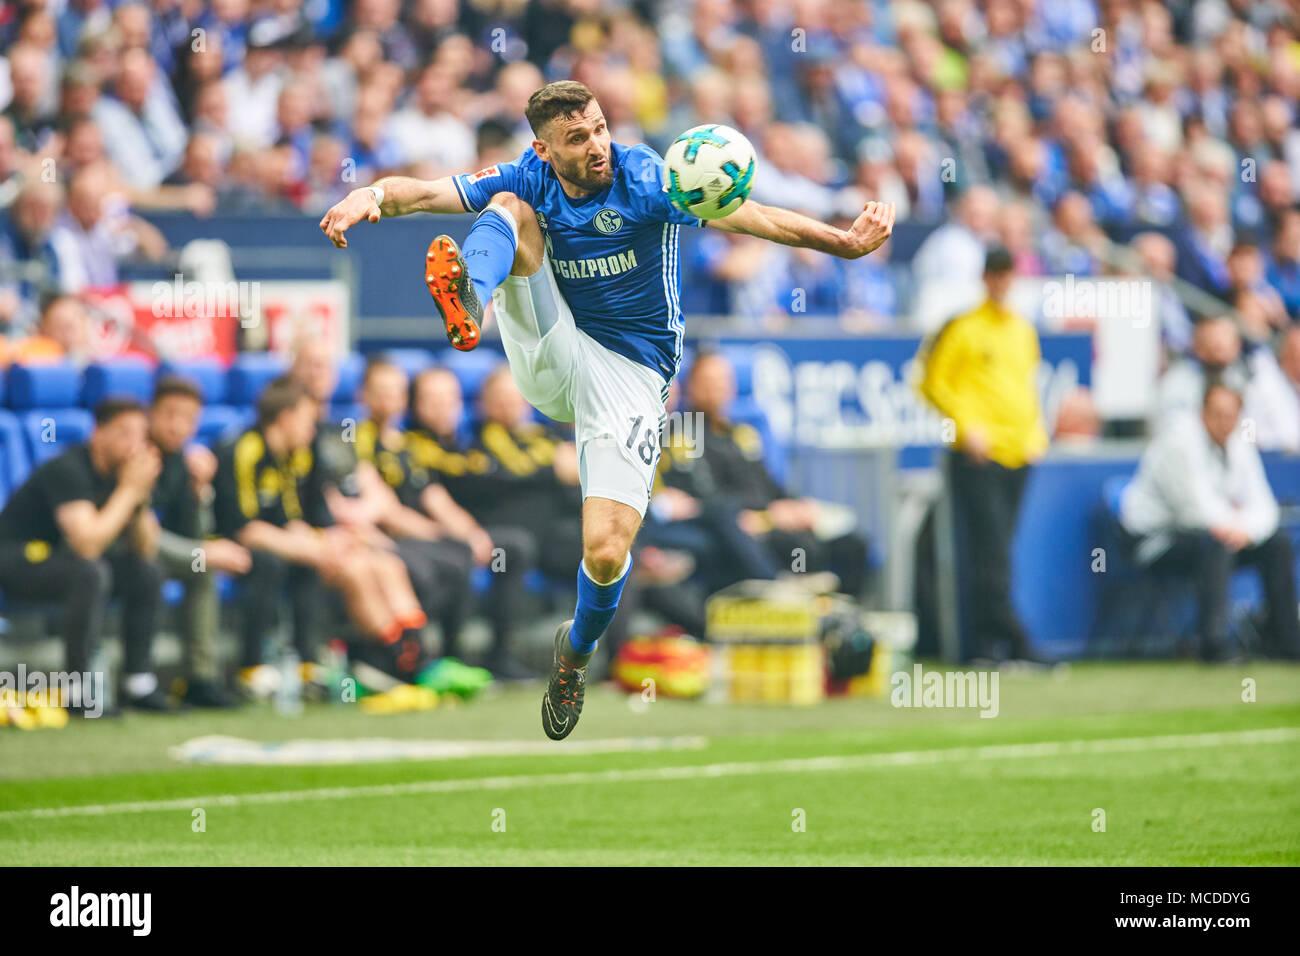 Gelsenkirchen, Germany. 15th April 2018. FC Schalke-BVB Soccer, Gelsenkirchen, April 15, 2018 Daniel CALIGIURI, S04 Nr. 18  drives the ball, action, full-size,    FC SCHALKE 04 -  BORUSSIA DORTMUND 2-0 1.Division, German Football League, Gelsenkirchen, April 15, 2018,  Season 2017/2018 © Peter Schatz / Alamy Live News - Stock Image